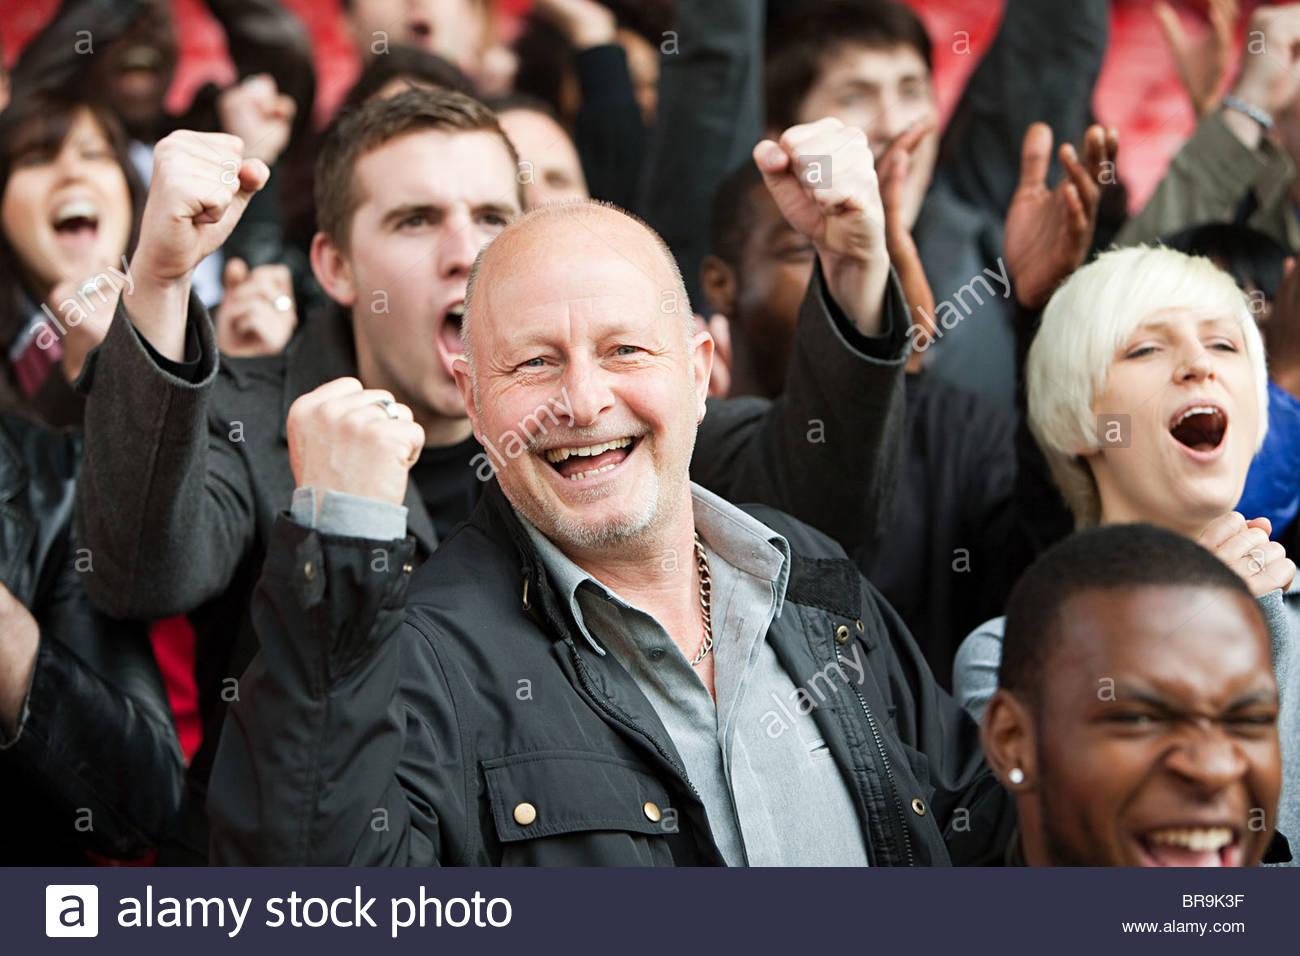 Happy man at football match - Stock Image